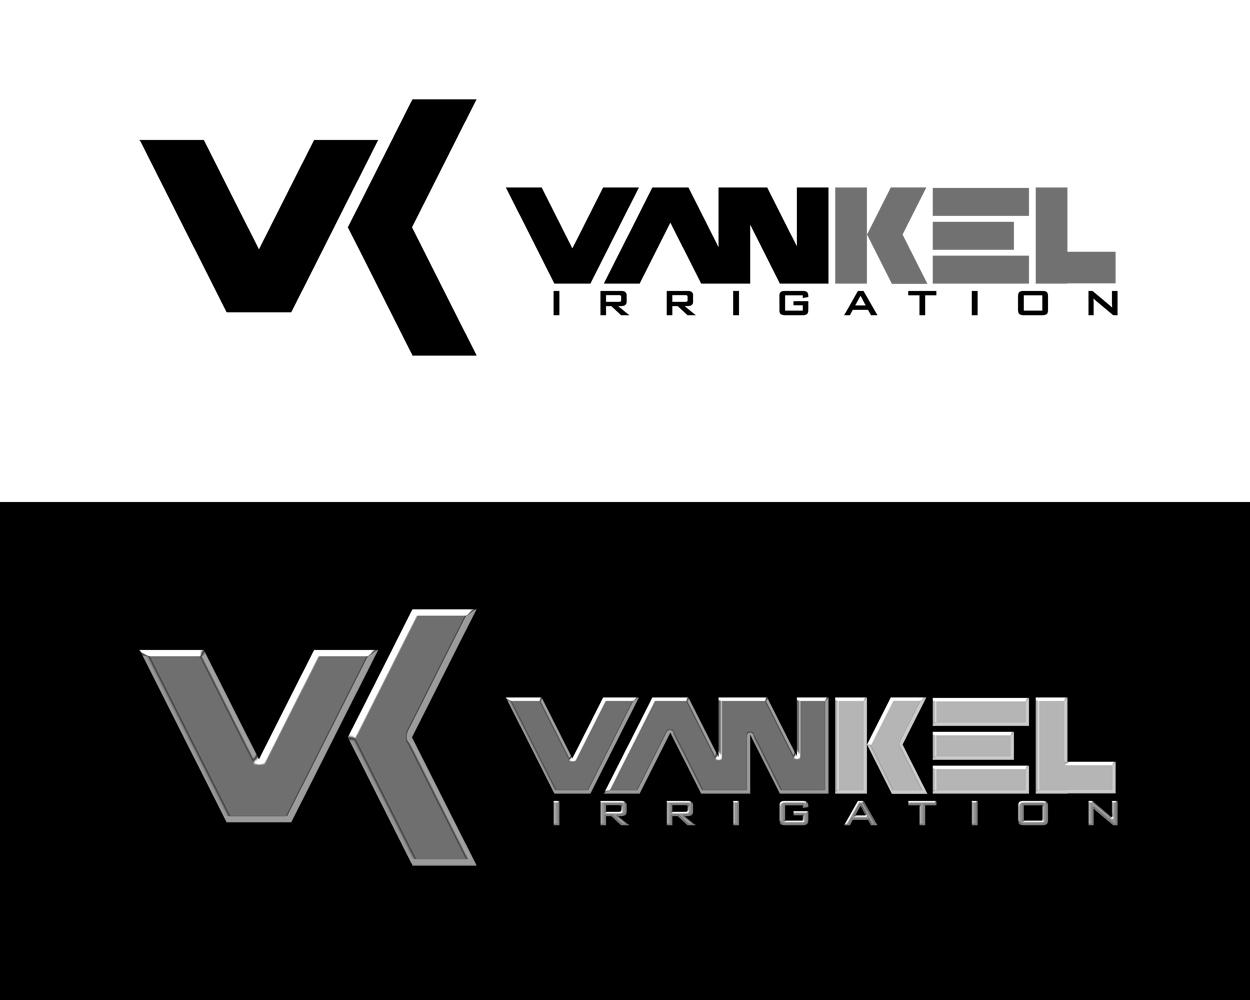 Logo Design by moidgreat - Entry No. 225 in the Logo Design Contest Van-Kel Irrigation Logo Design.